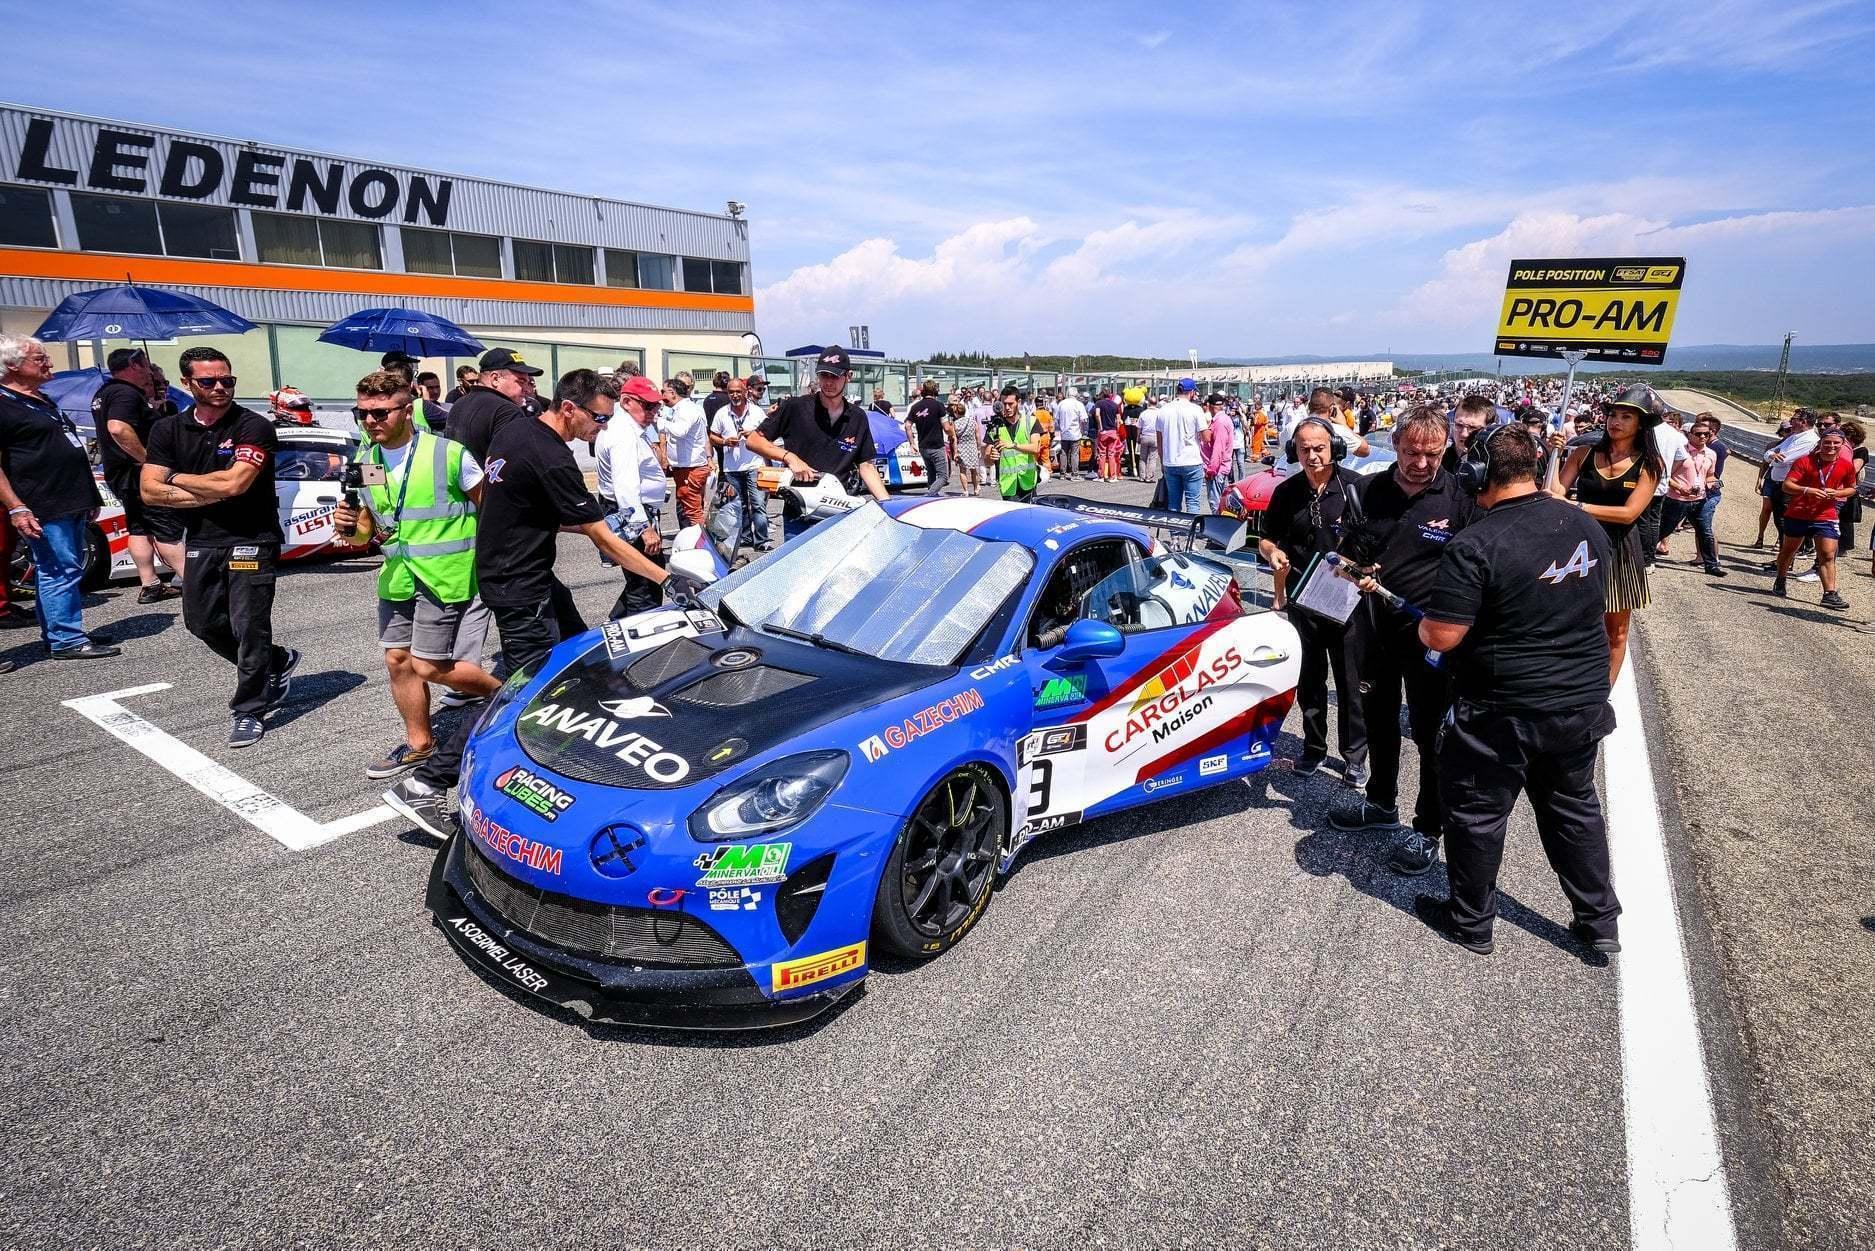 FFSA GT: CMR reprend la main Lédenon ! (Course 2) 9